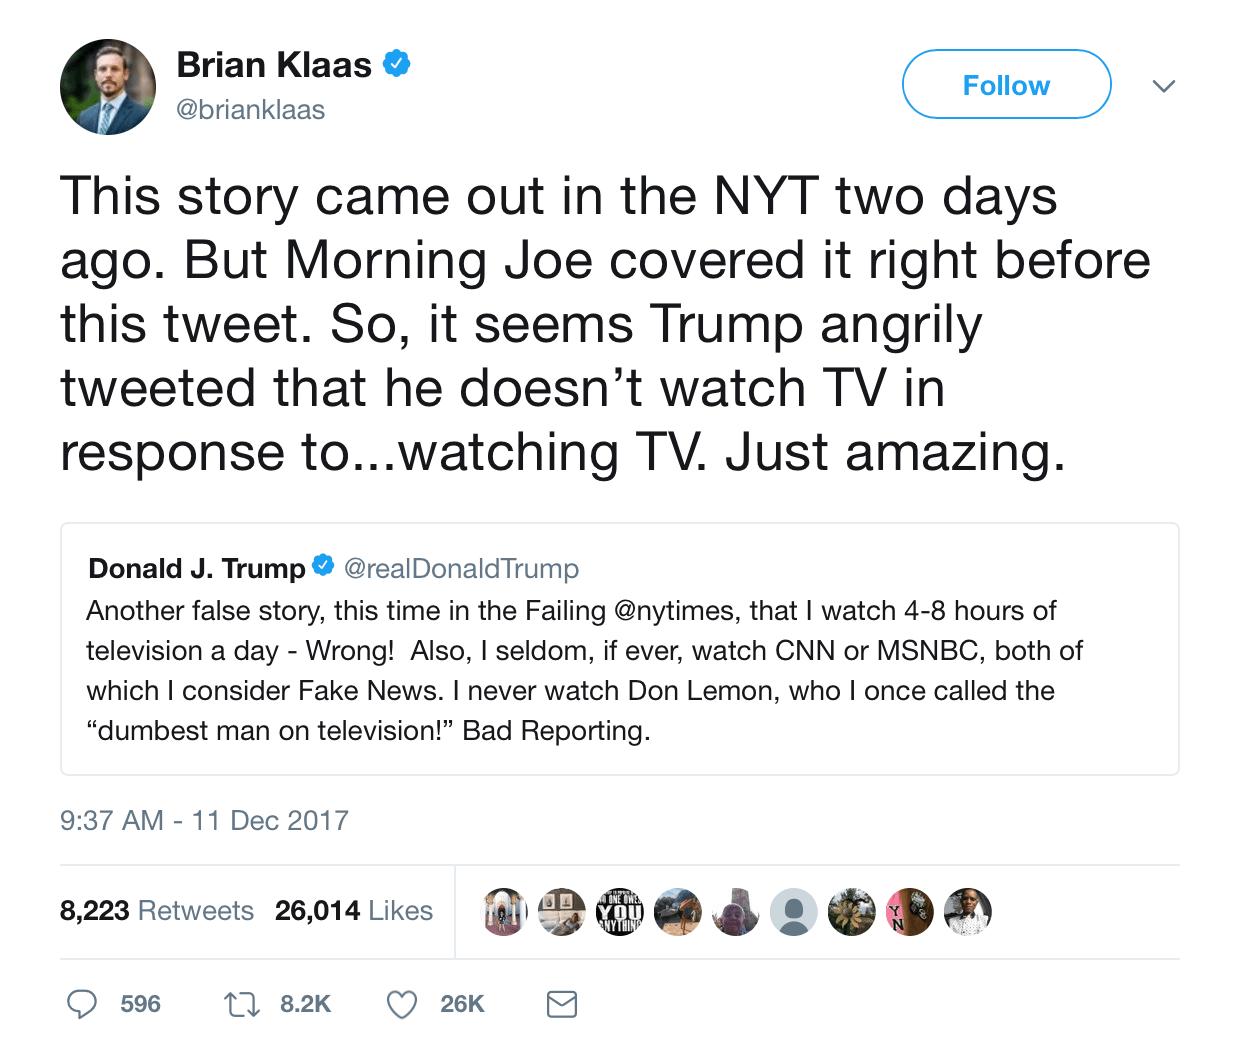 A screenshot of a tweet from Brian Klaas